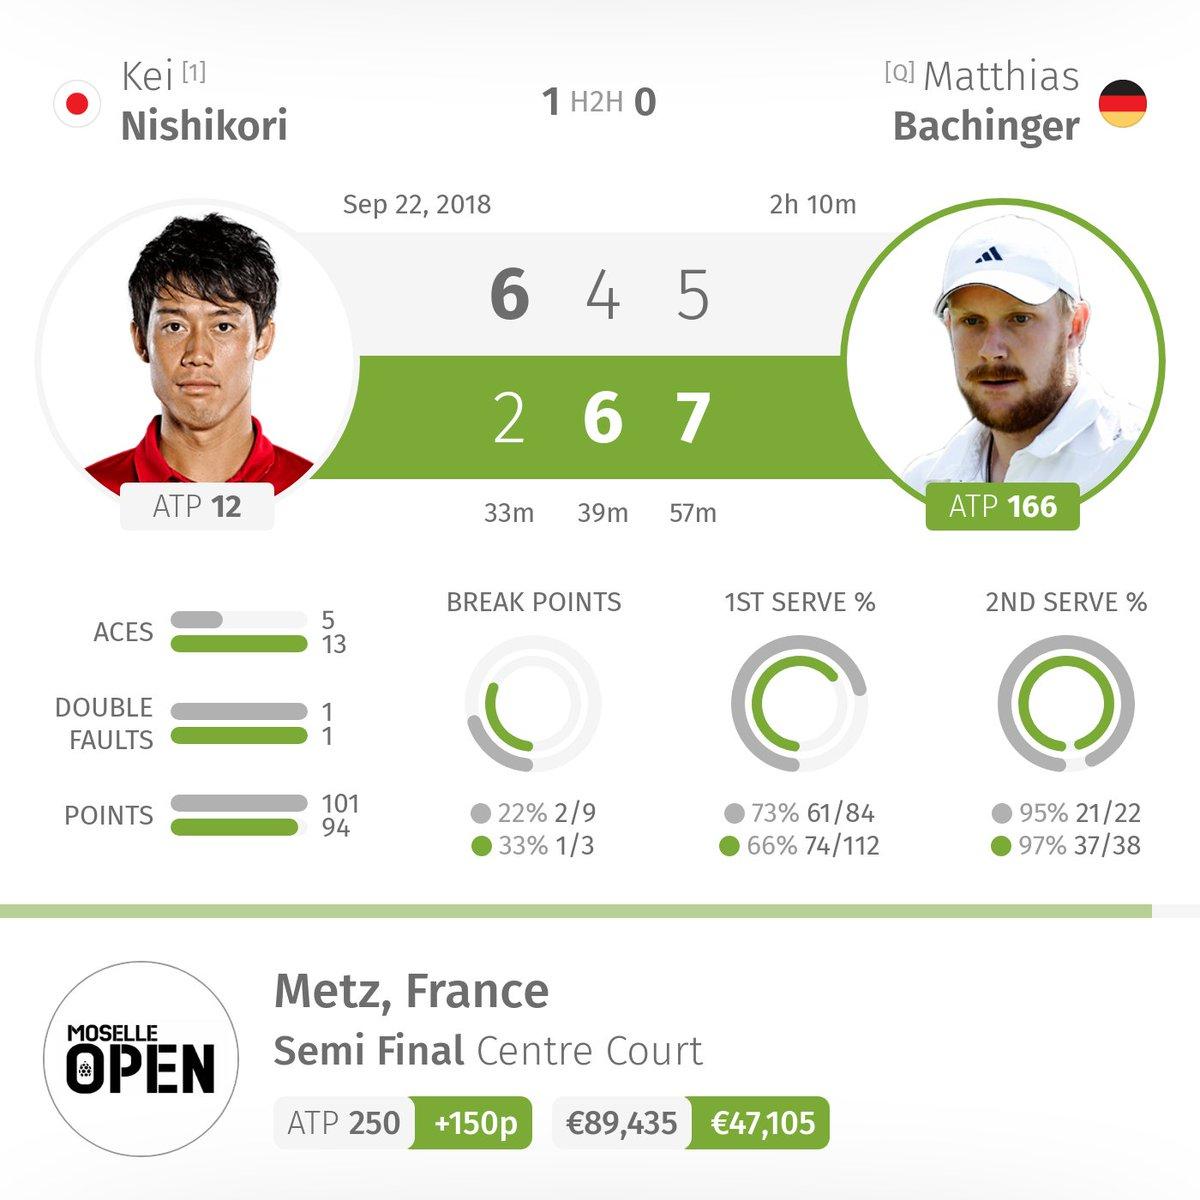 Bela Bola Tennis On Twitter Matthias Bachinger Def Kei Nishikori Keinishikori 2x6 6x4 7x5 Semi Final 2h 10m 47105 150